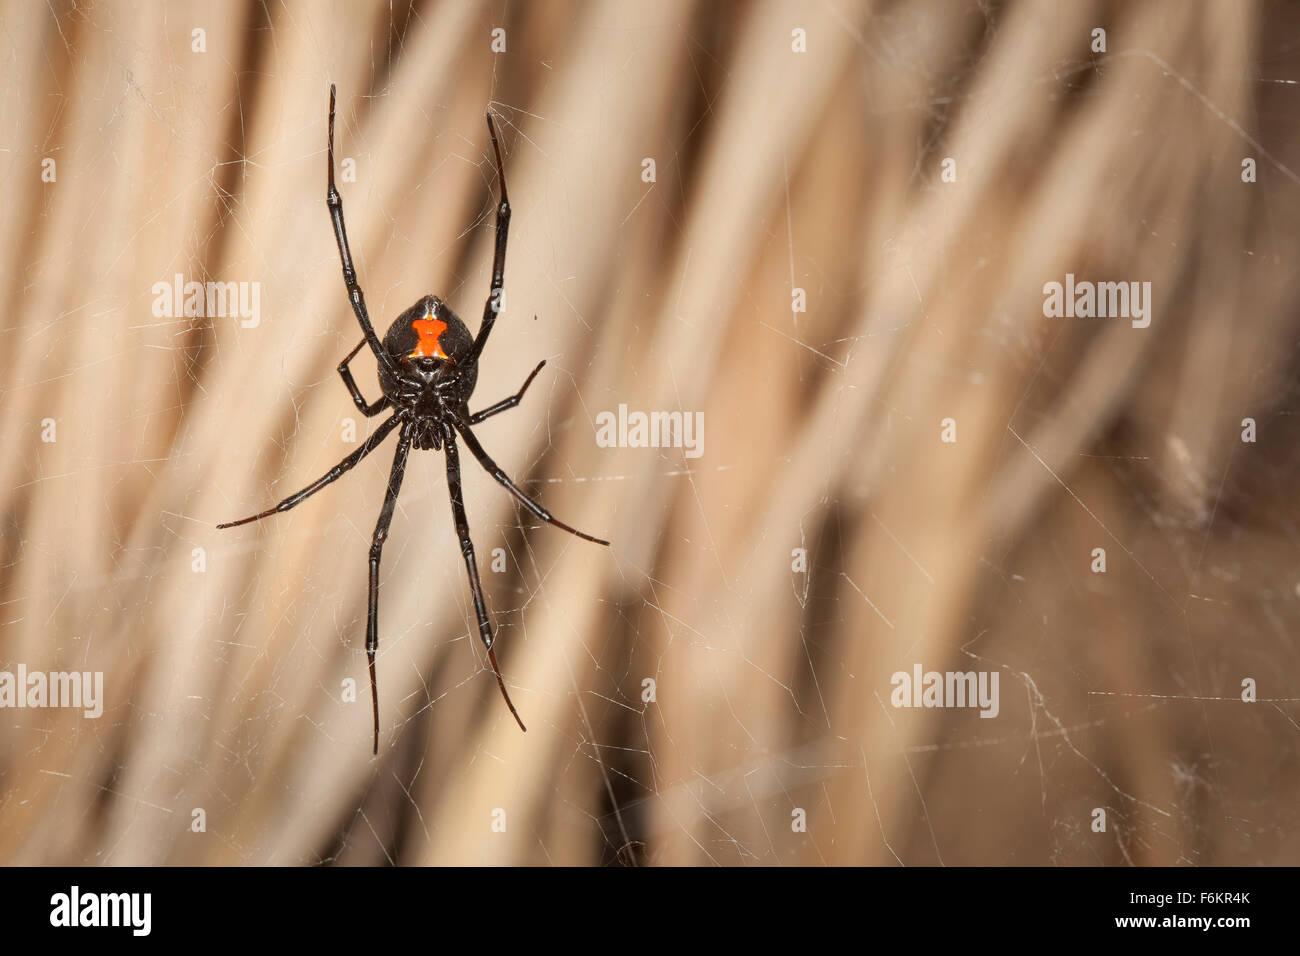 Underside of a western black widow spider (Latrodectus hesperus) in its web. - Stock Image